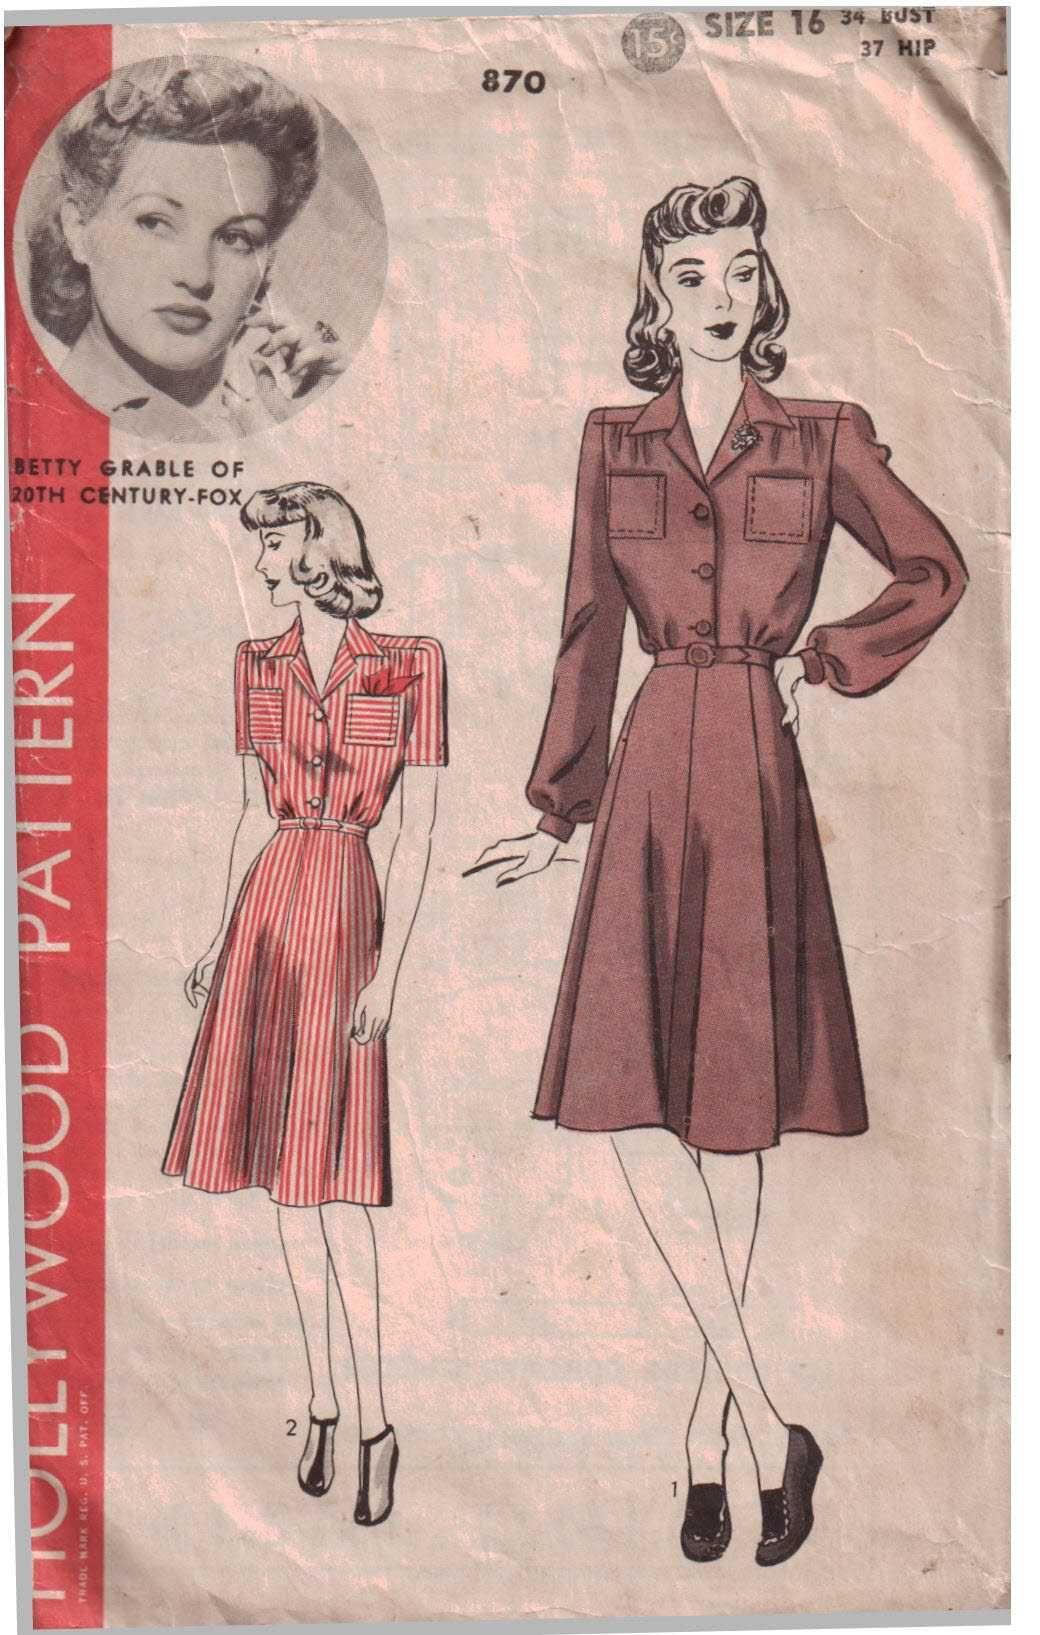 Hollywood Pattern 870 Dress Size 16 Used Vintage Sewing Patterns Vintage Sewing Vintage Dress Patterns